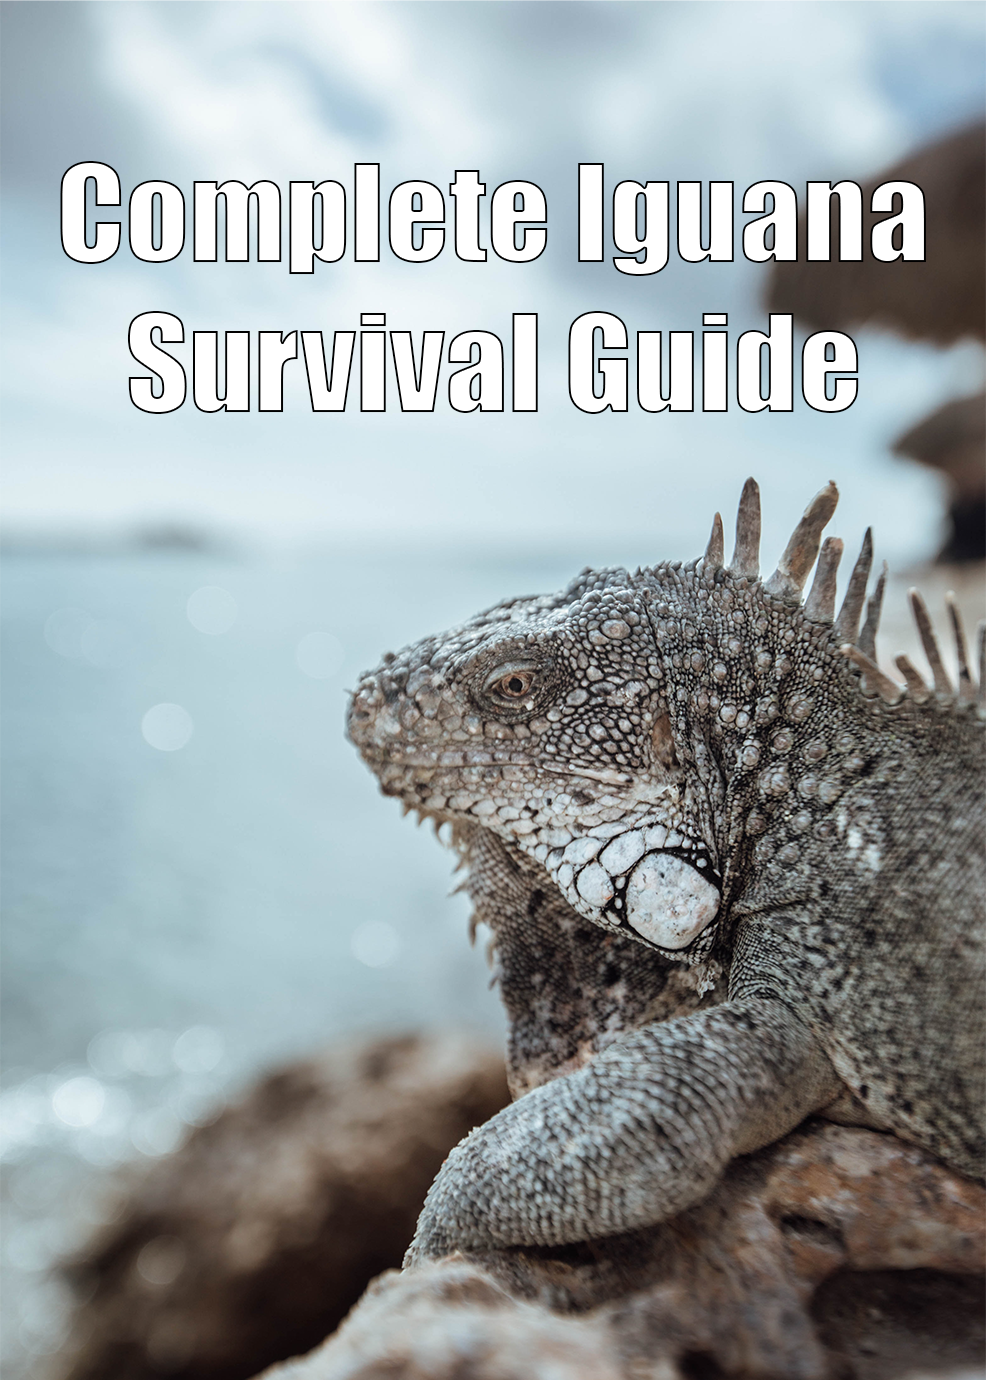 Complete Iguana Survival Guide